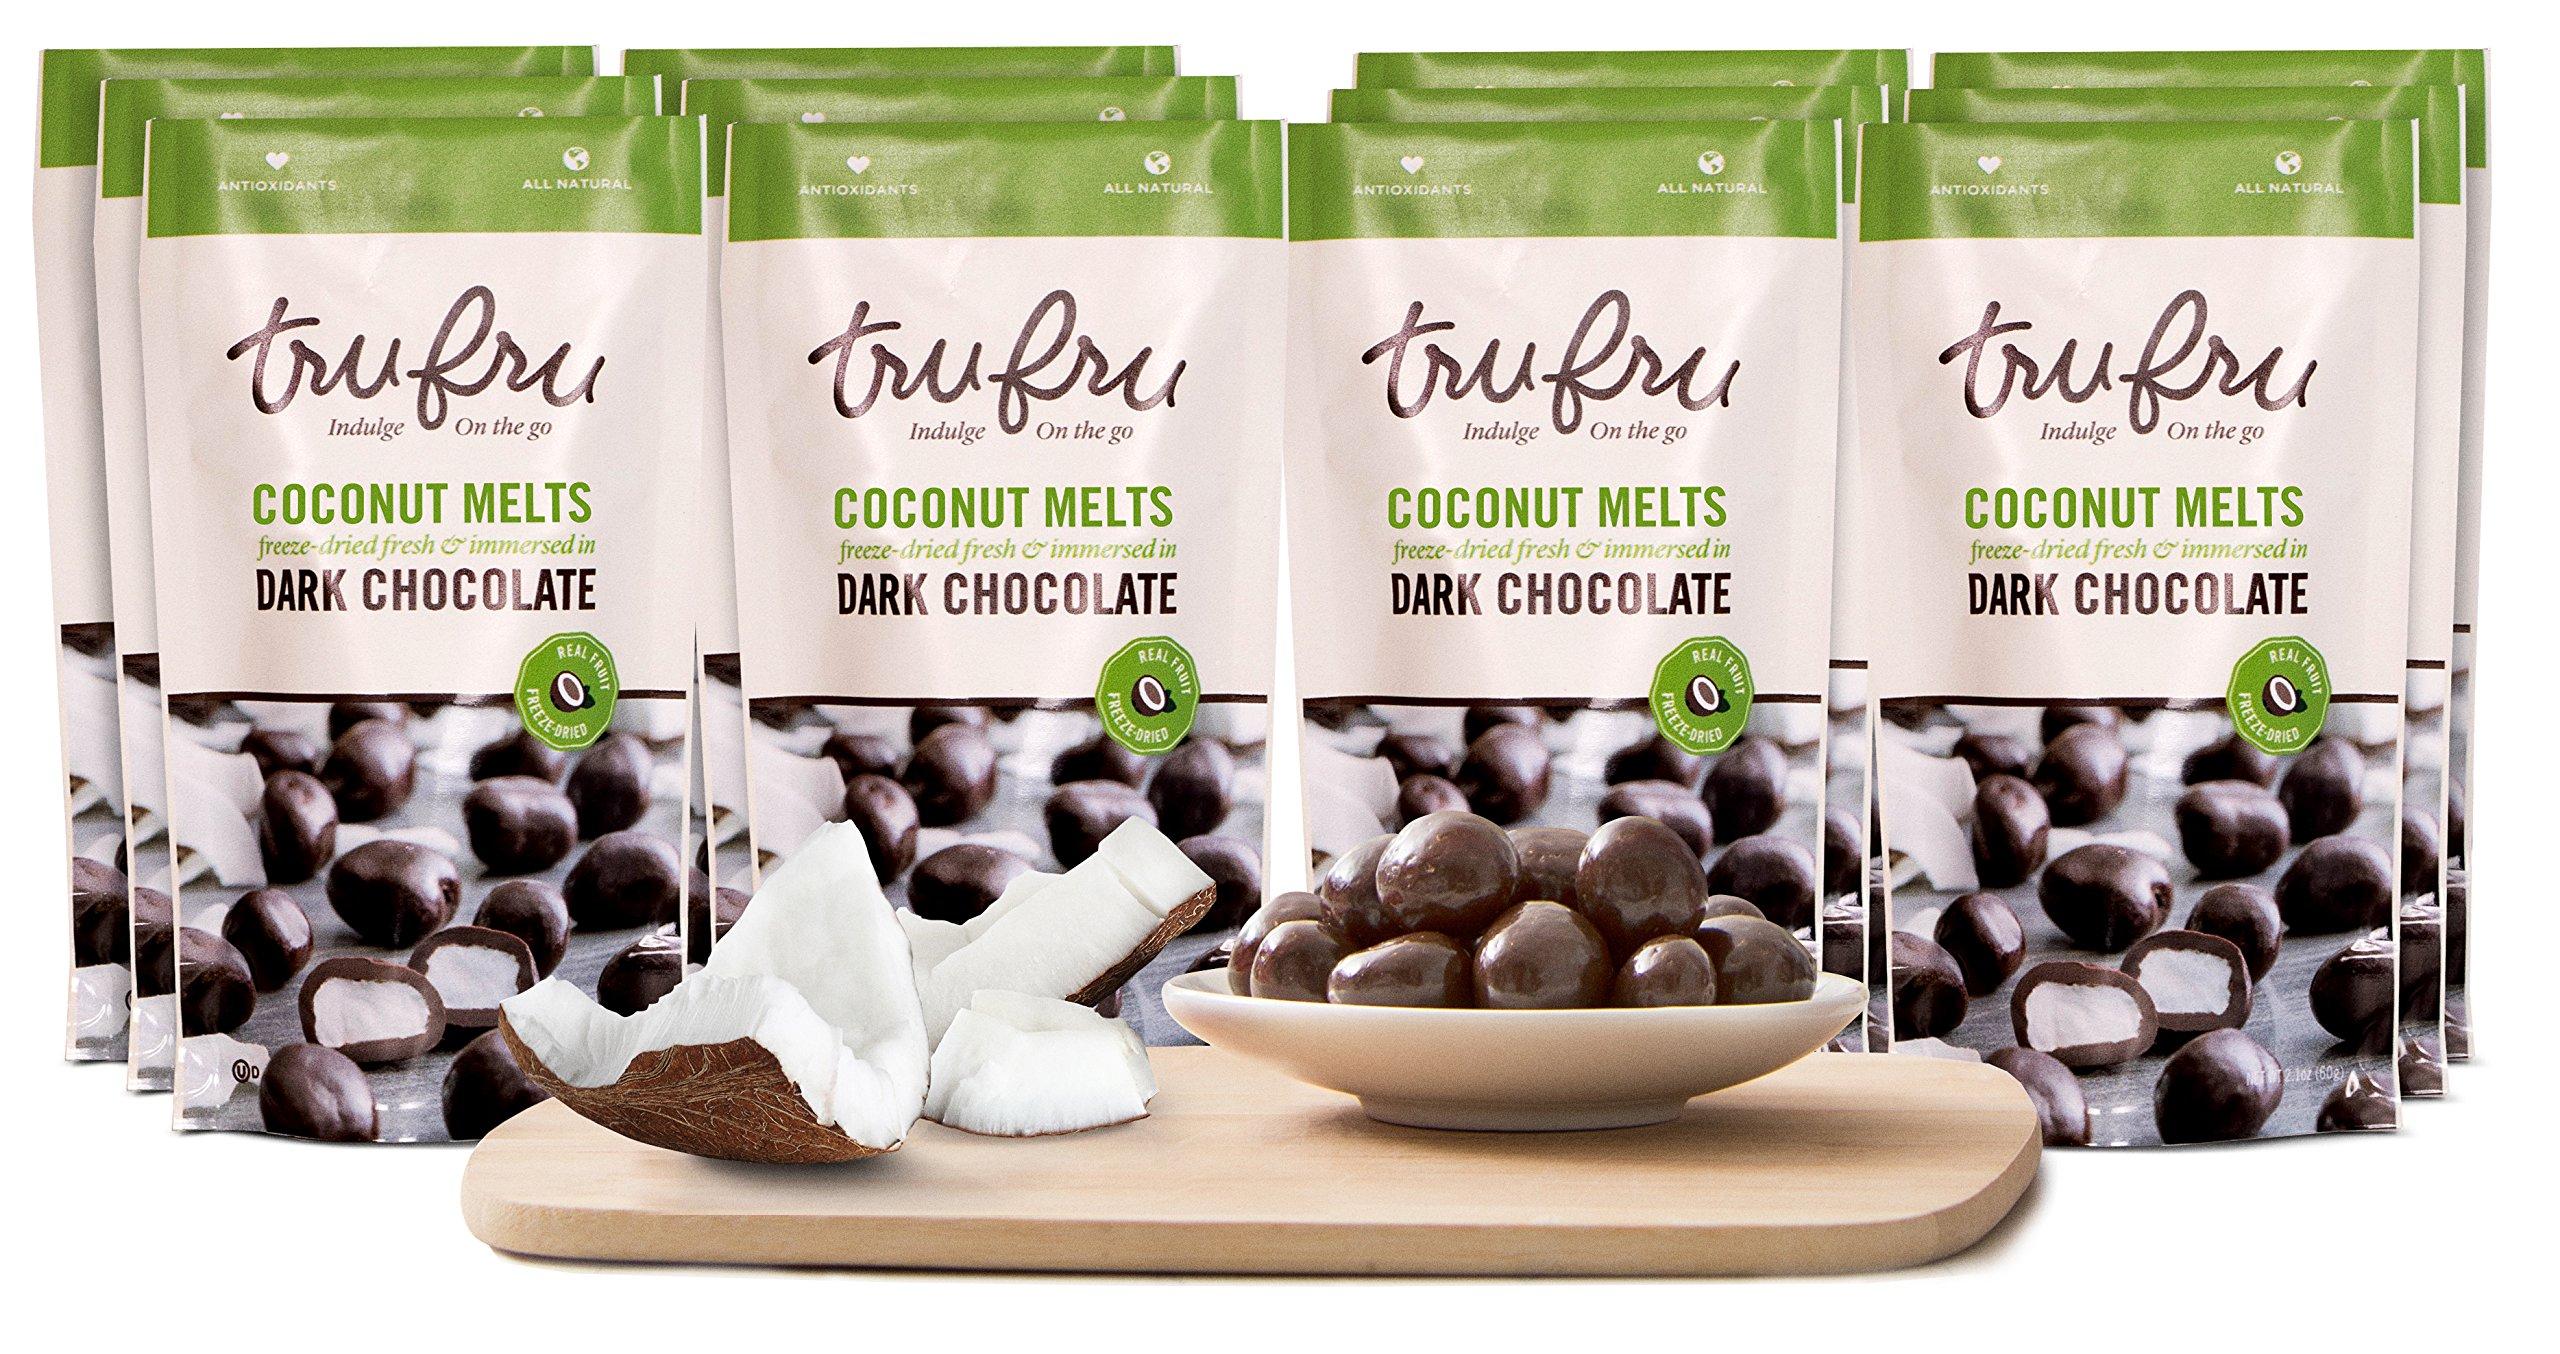 Tru Fru Dark Chocolate Dipped Freeze-Dried Fruit, 12-Pack Grab & Go, Coconut